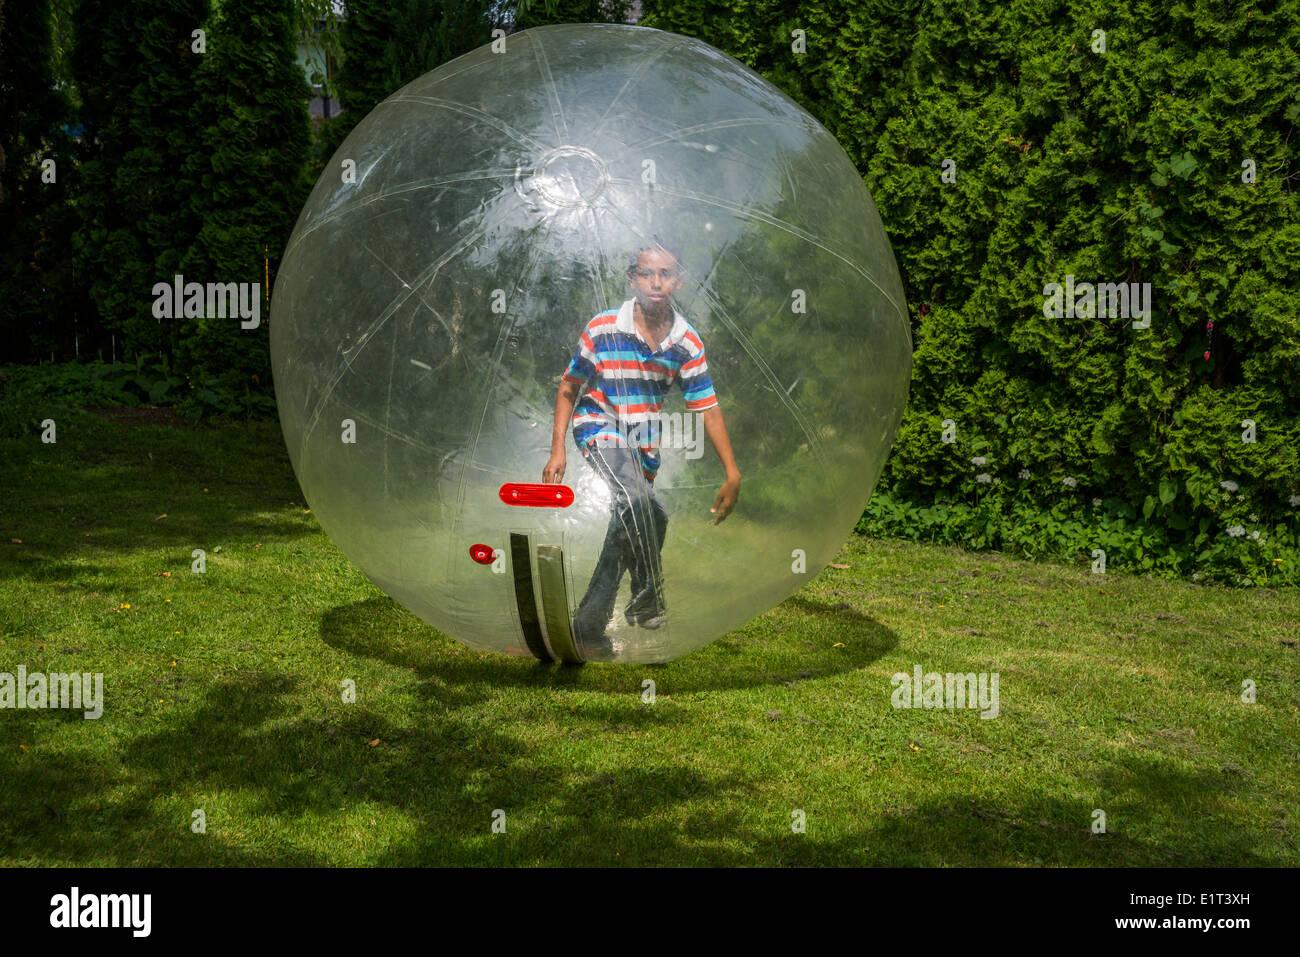 Junge in einer Blase-Kugel. Stockbild